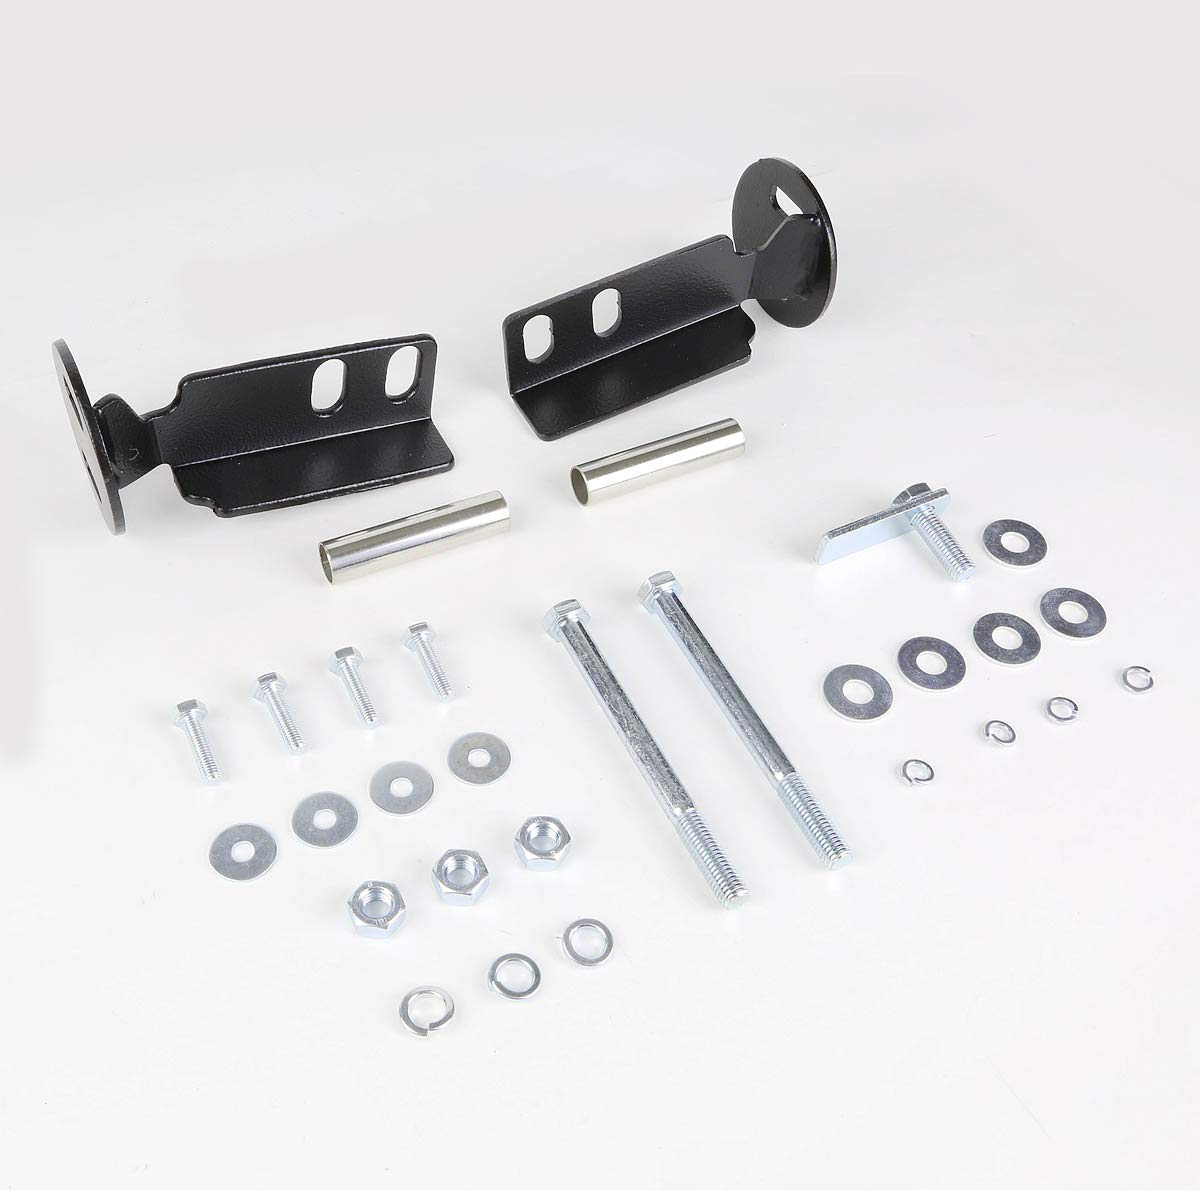 For Chevy Silverado//GMC Sierra GMT900 3 Bumper Push Bull Bar+Removable Skid Plate Black